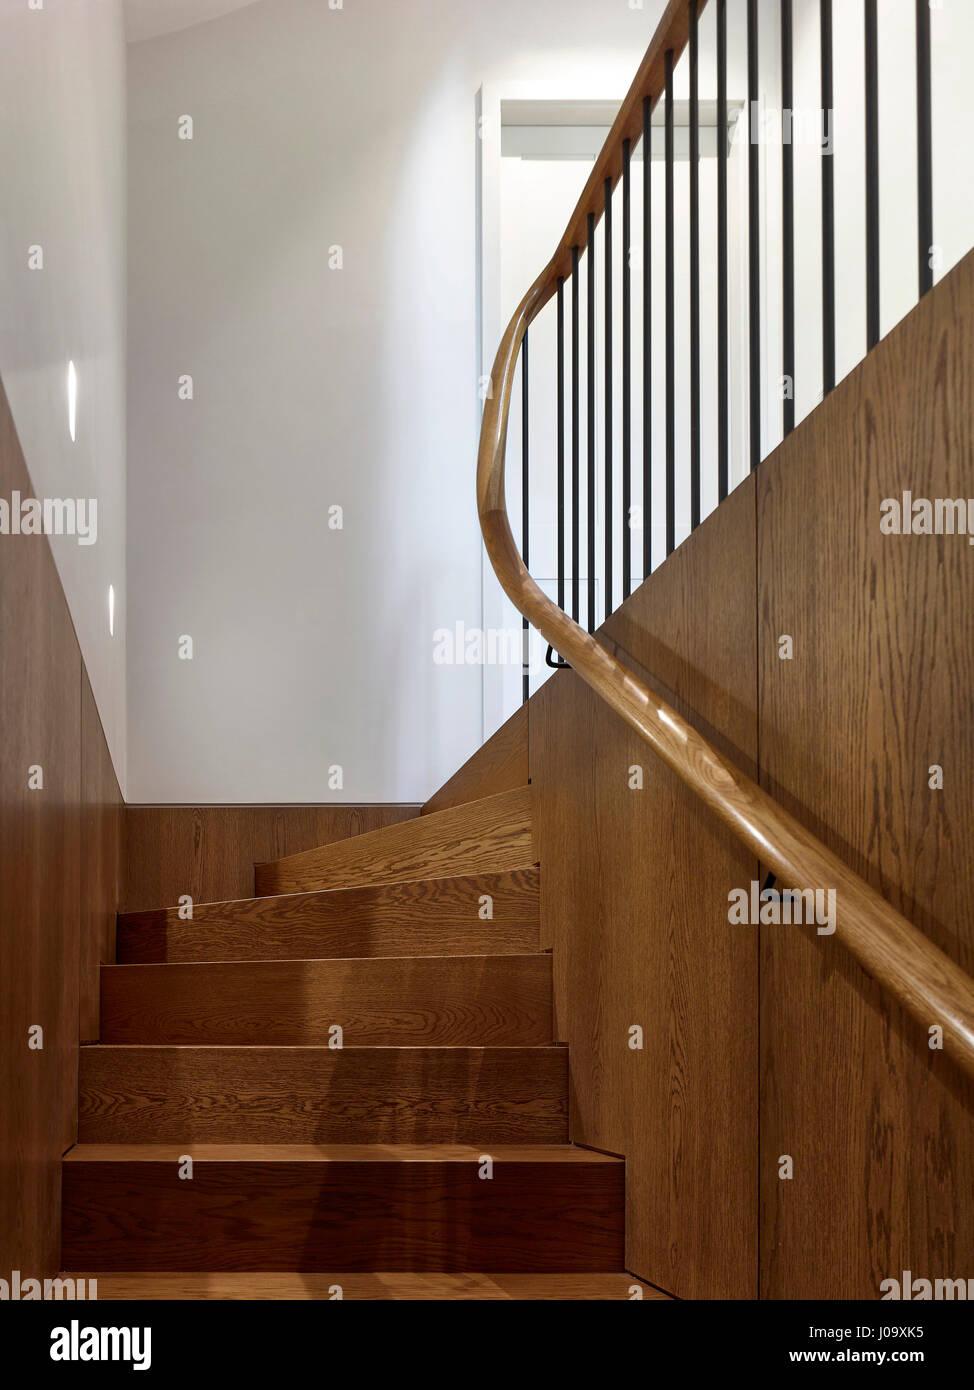 Stair. Hampstead Ponds House, London, United Kingdom. Architect: Stiff + Trevillion Architects, 2016. - Stock Image